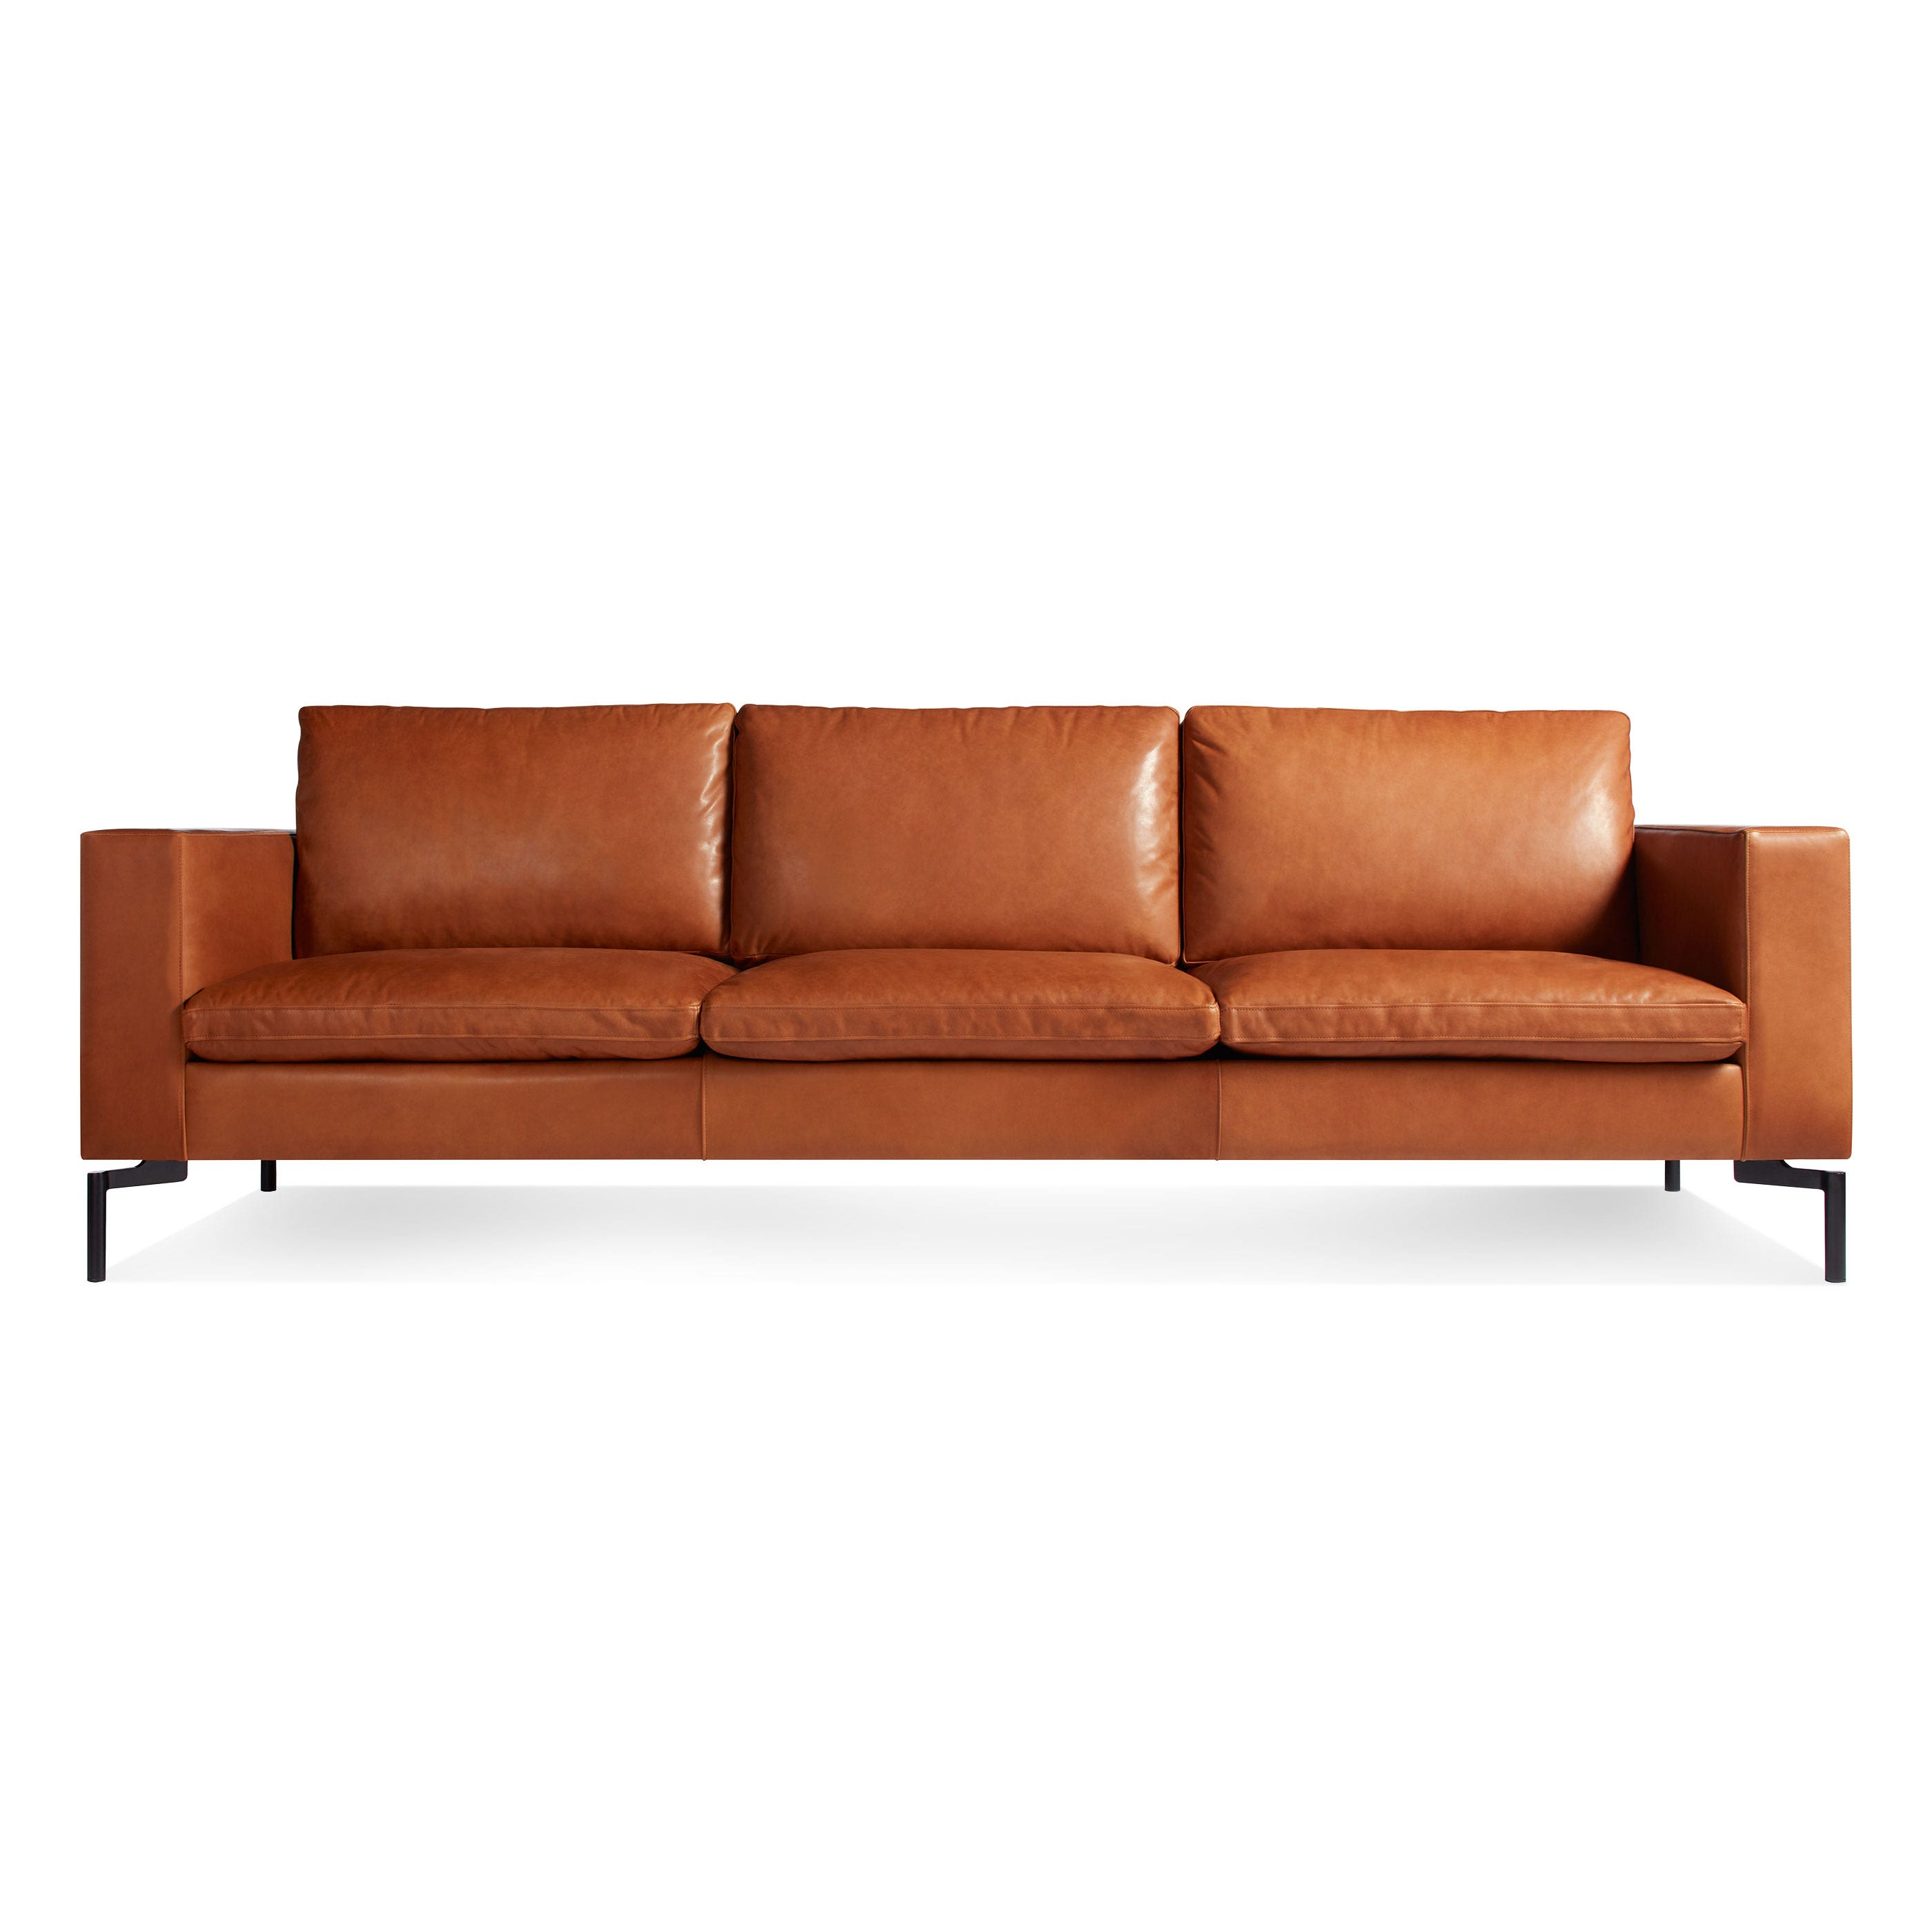 new standard  modern leather sofa  blu dot - previous image new standard modern black leather sofa